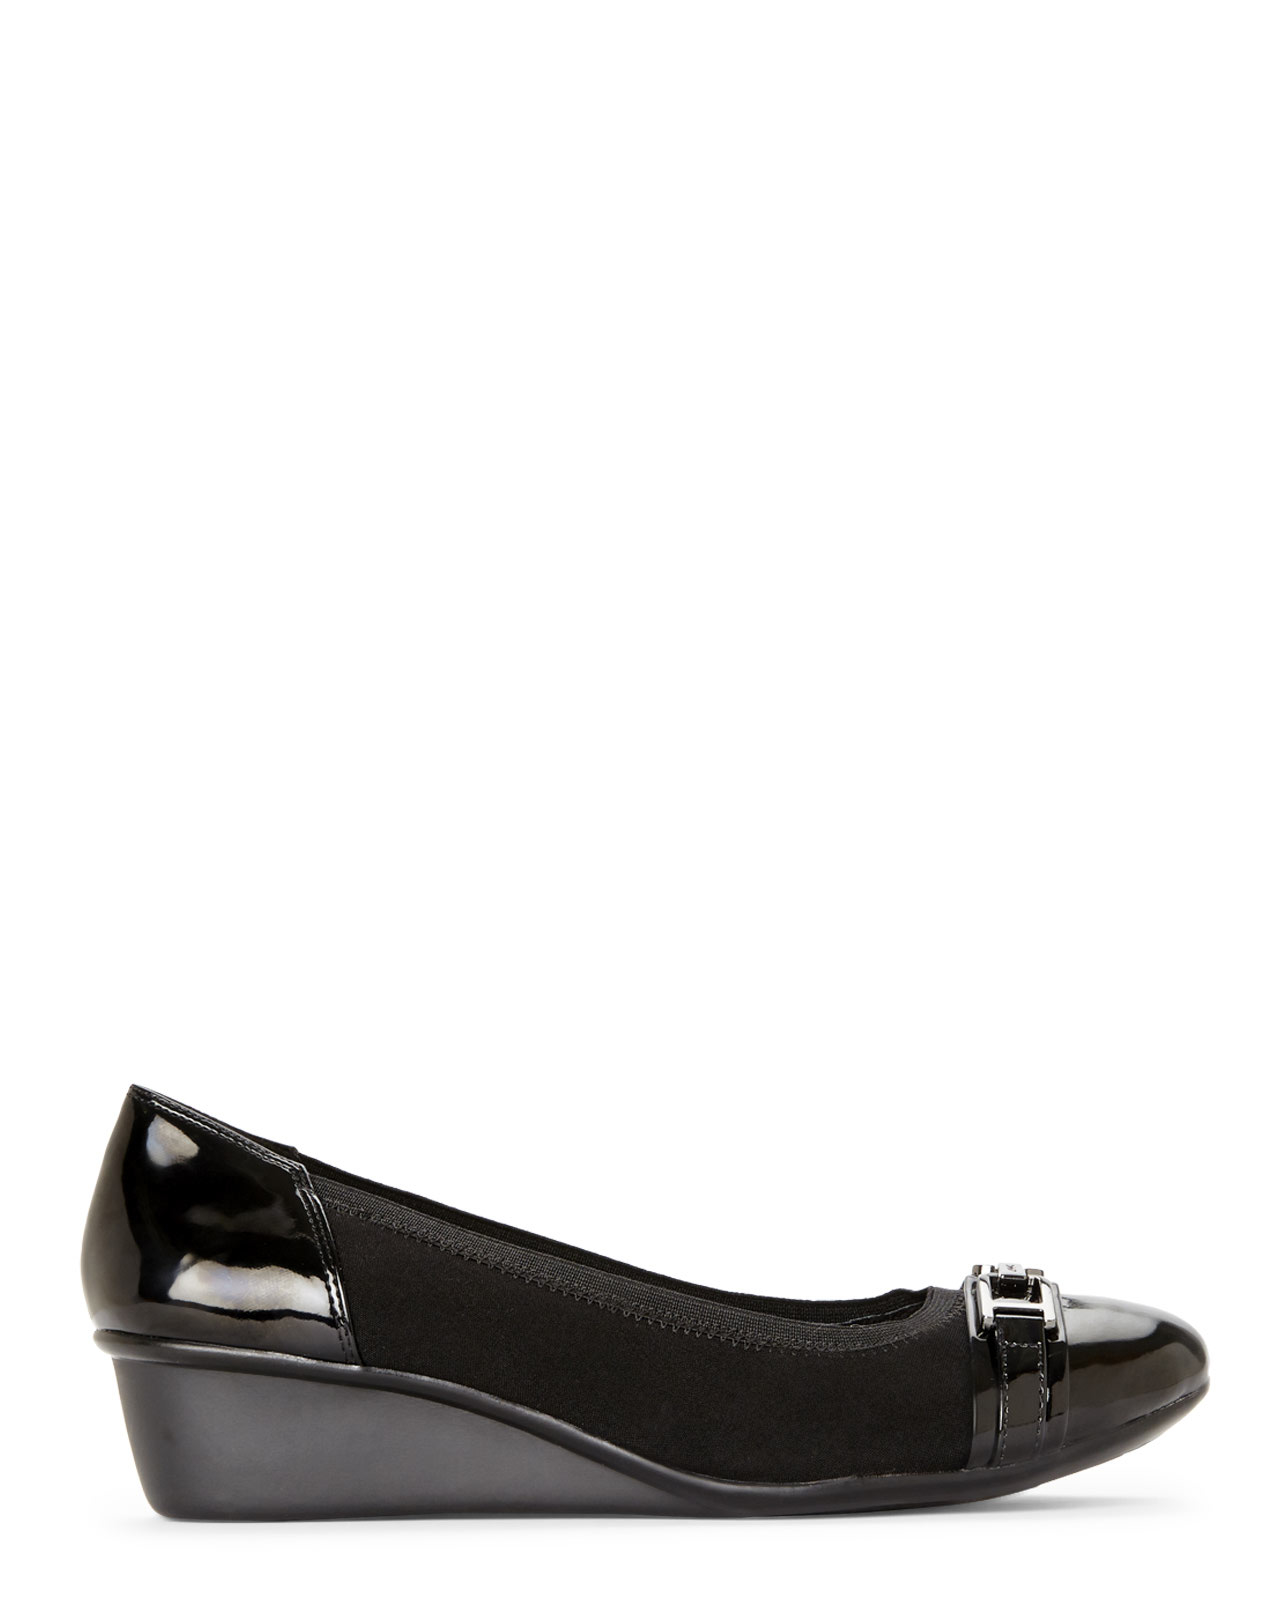 7fde6a61df02 Lyst - Anne Klein Carly2 in Black